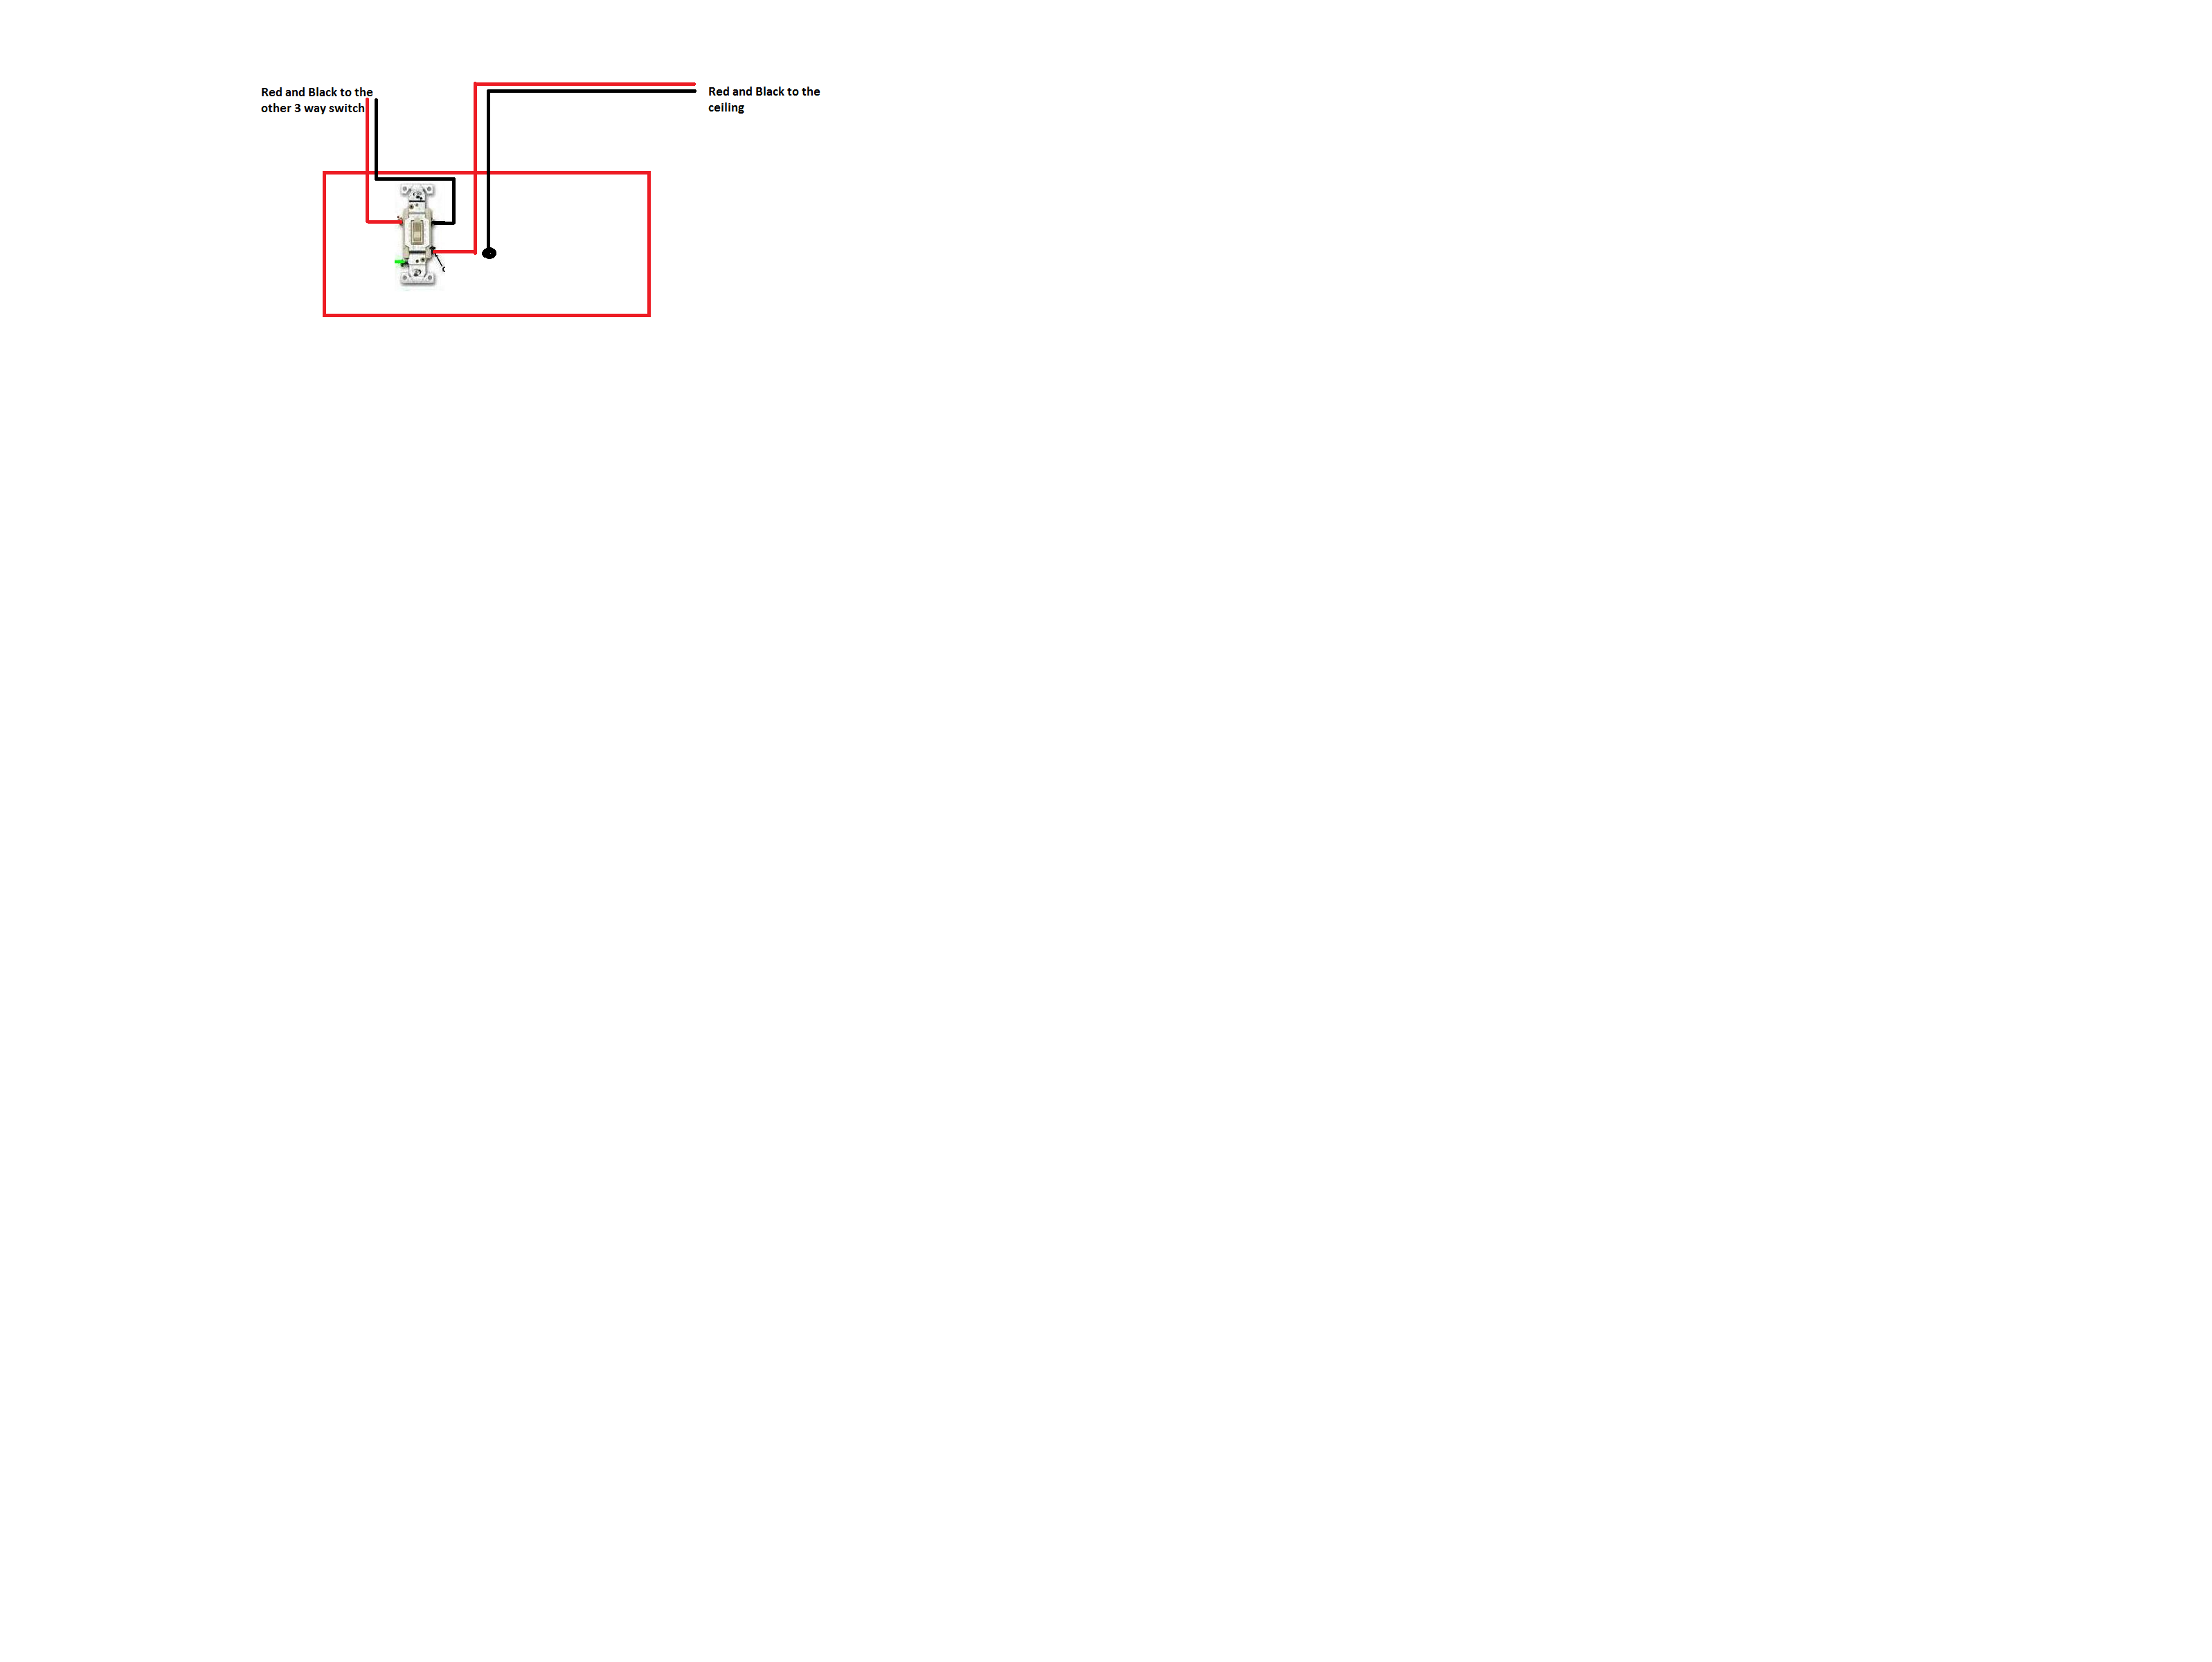 93e3da93-44dd-4386-a1ec-f90650e75c41_3 Way from Speed Controller.png